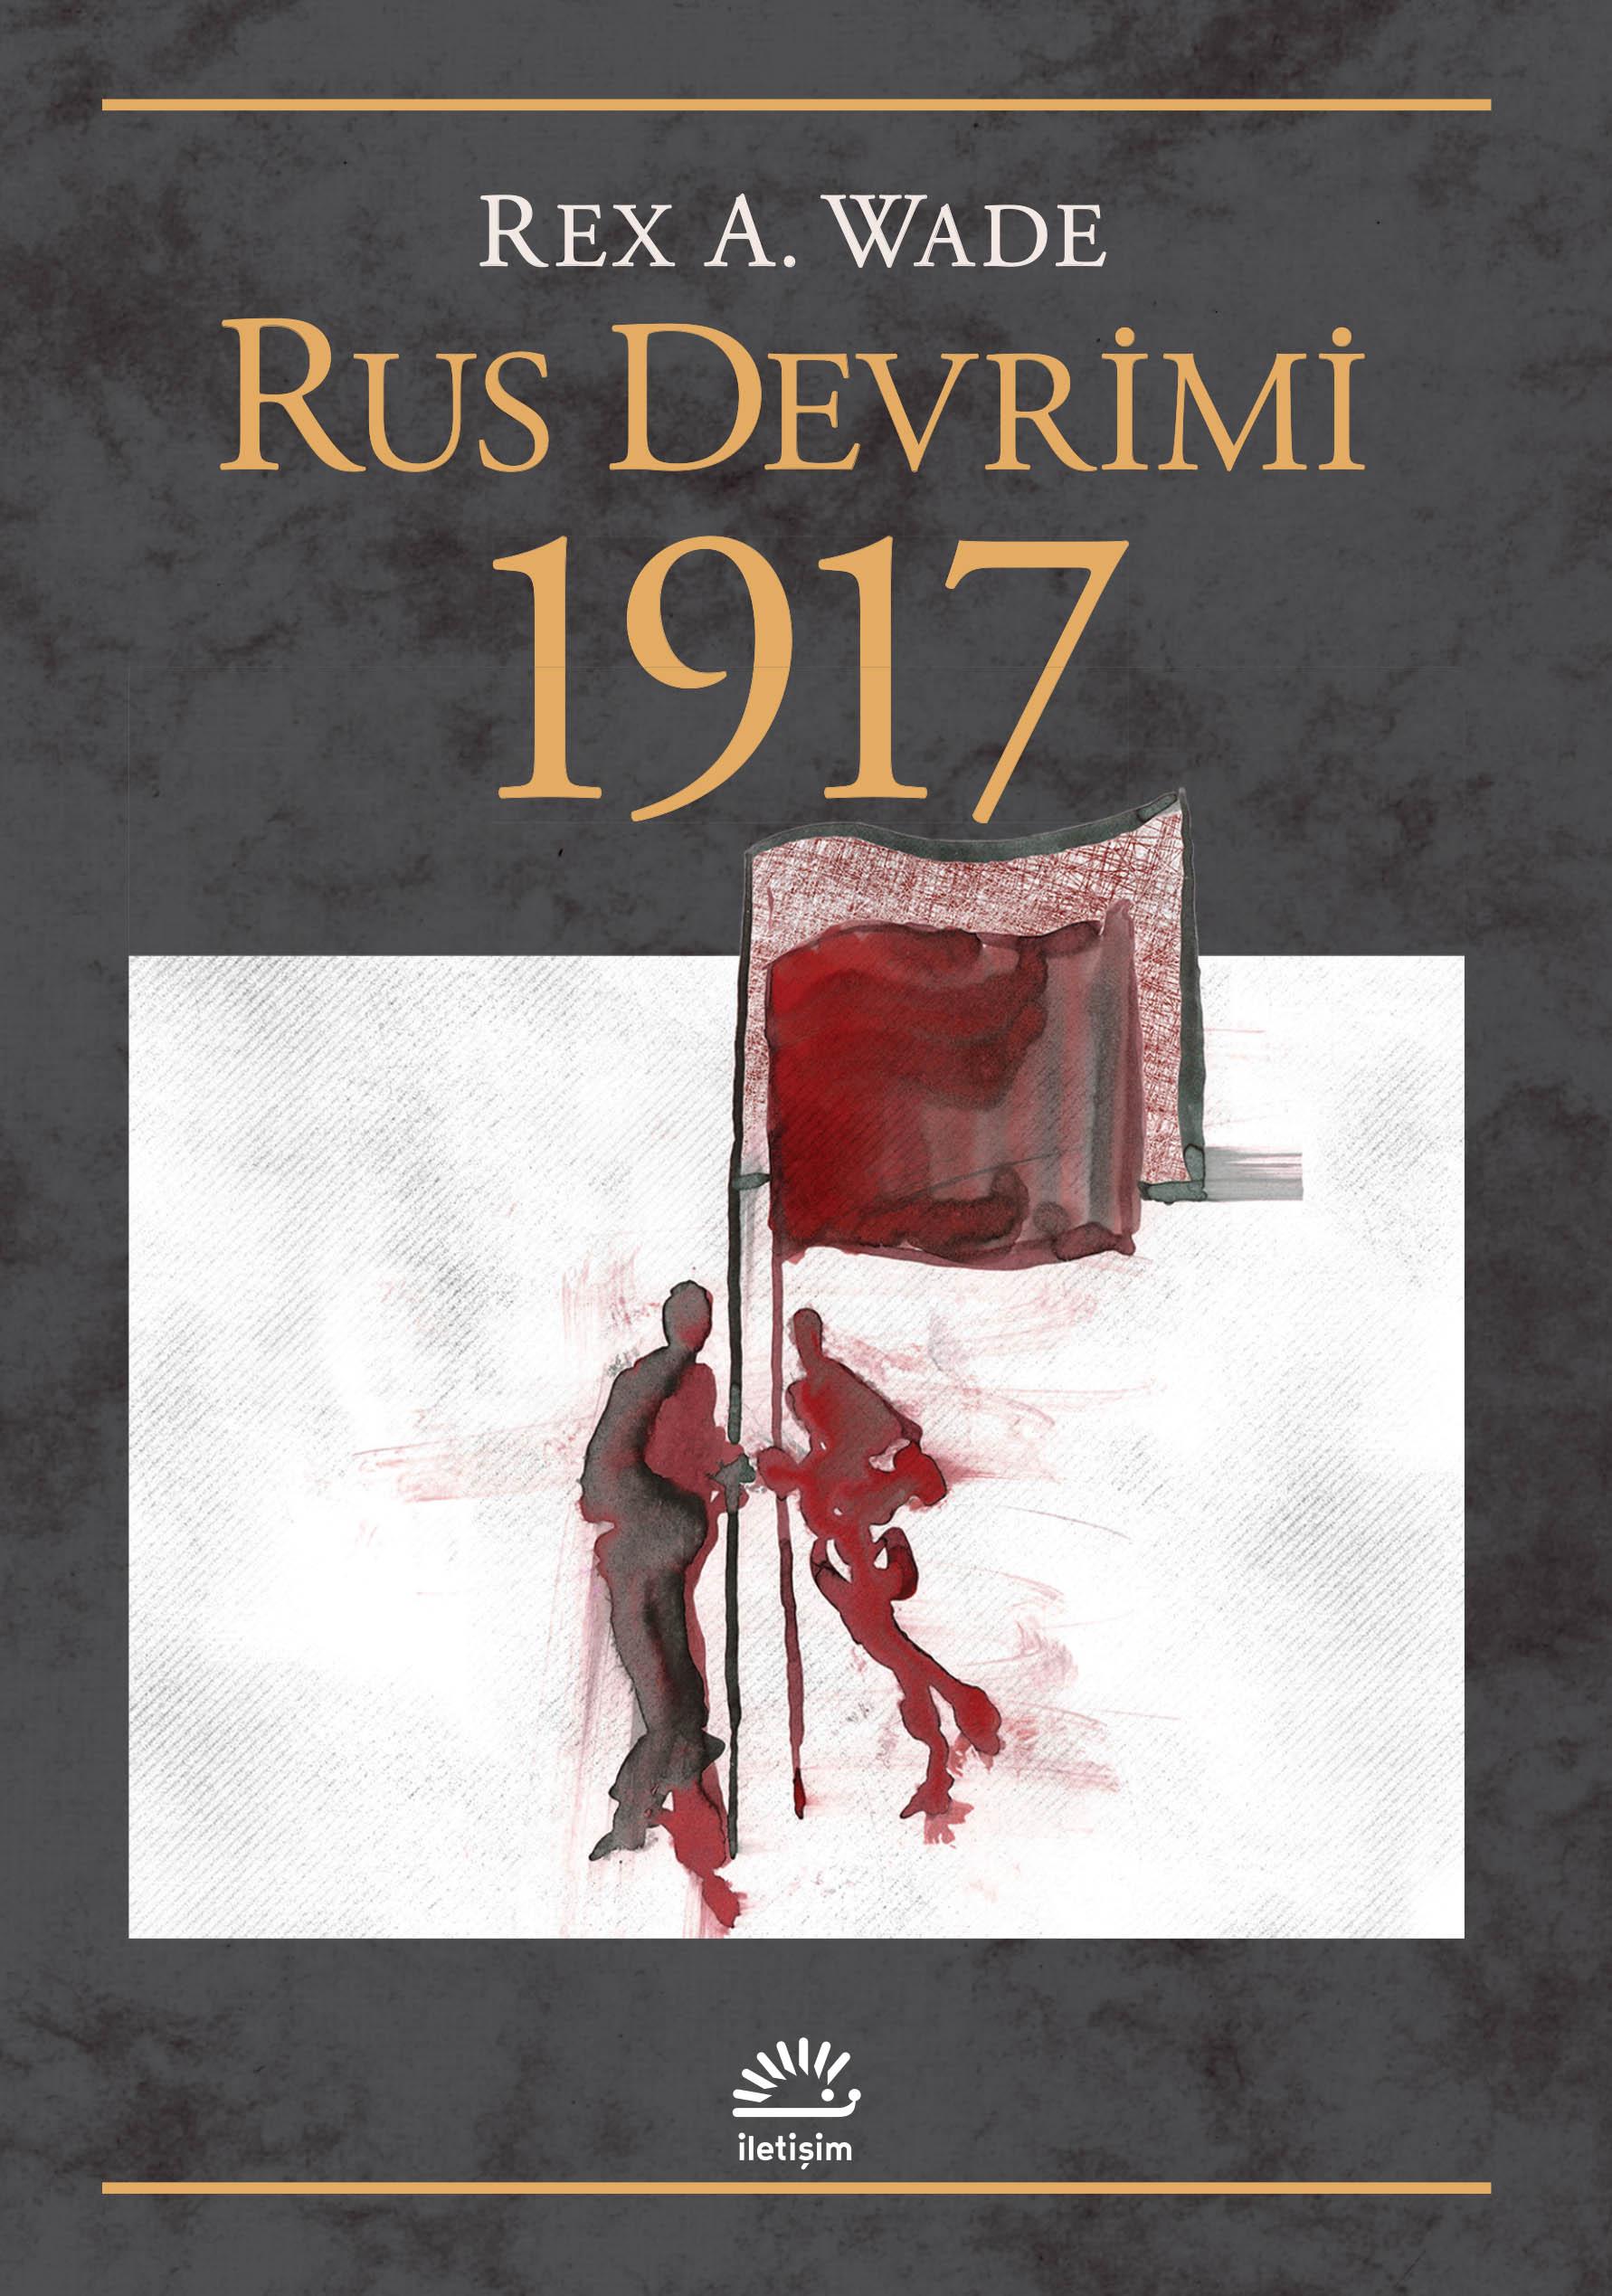 2616 RUSDEVRIMI.indd